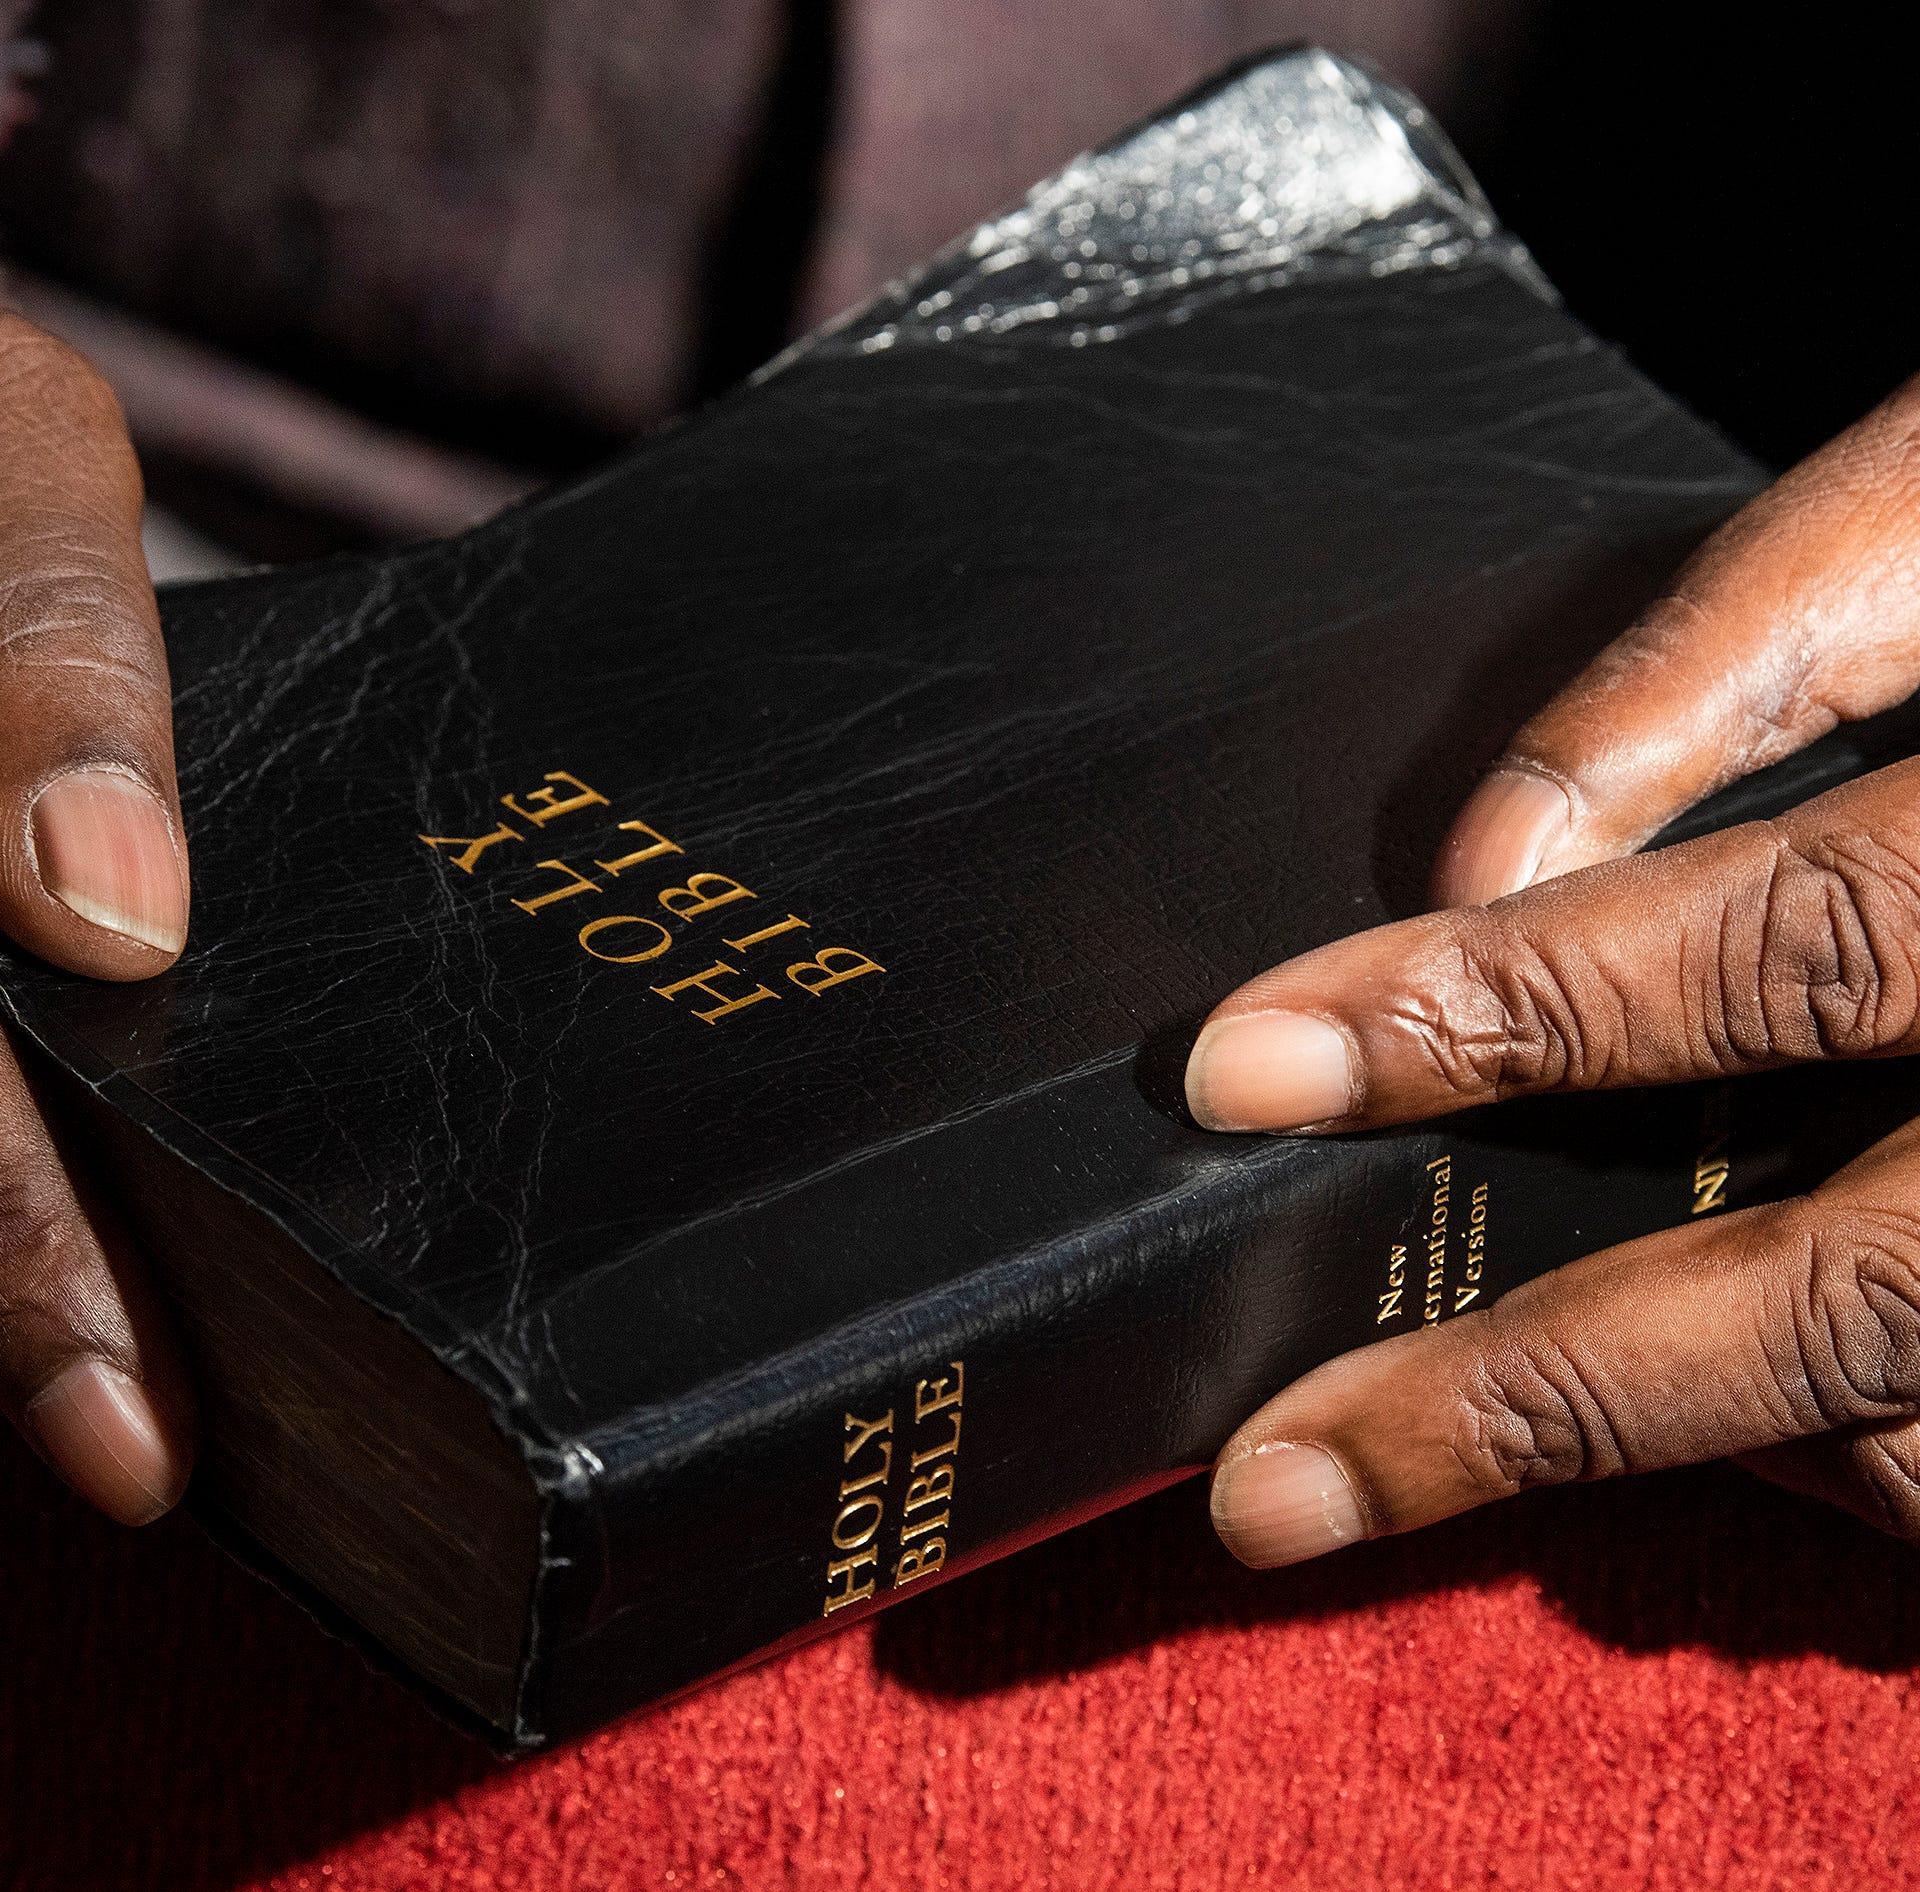 Do not teach the Bible in school